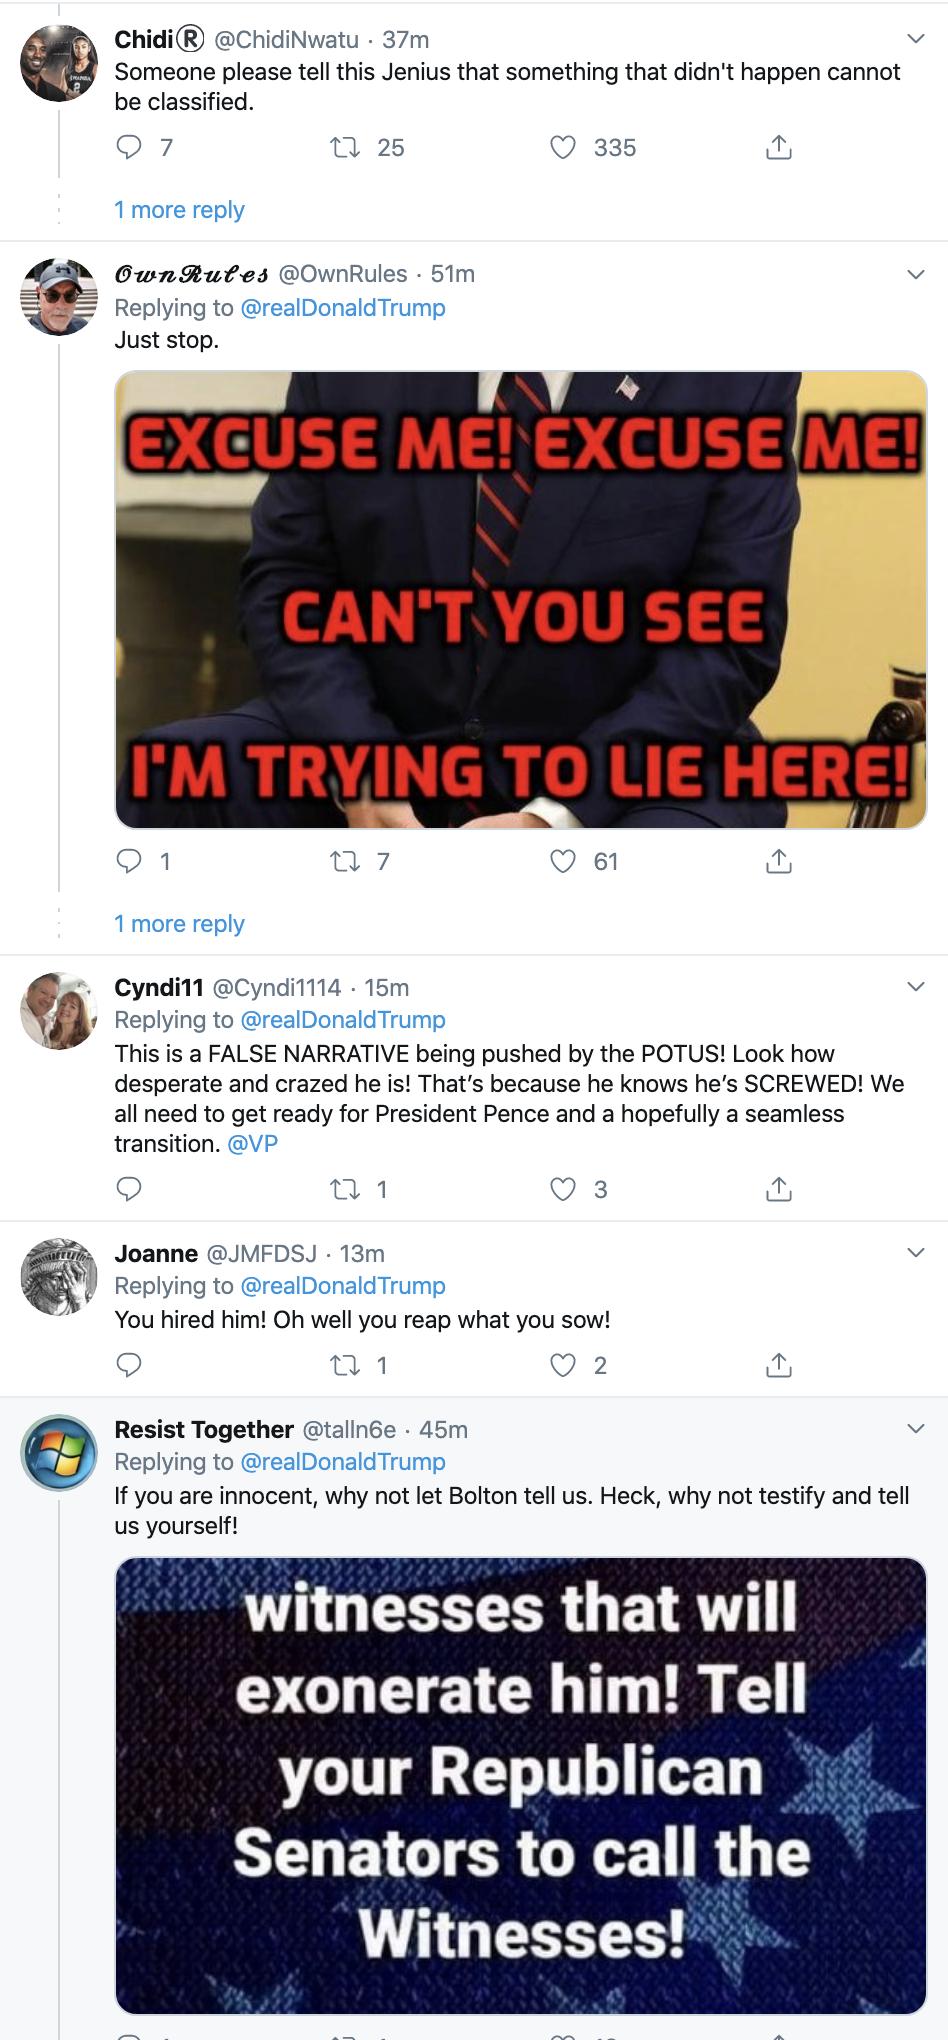 Screen-Shot-2020-01-29-at-7.22.05-AM Trump Rages Online About Historic Impeachment Corruption Featured Impeachment Politics Top Stories